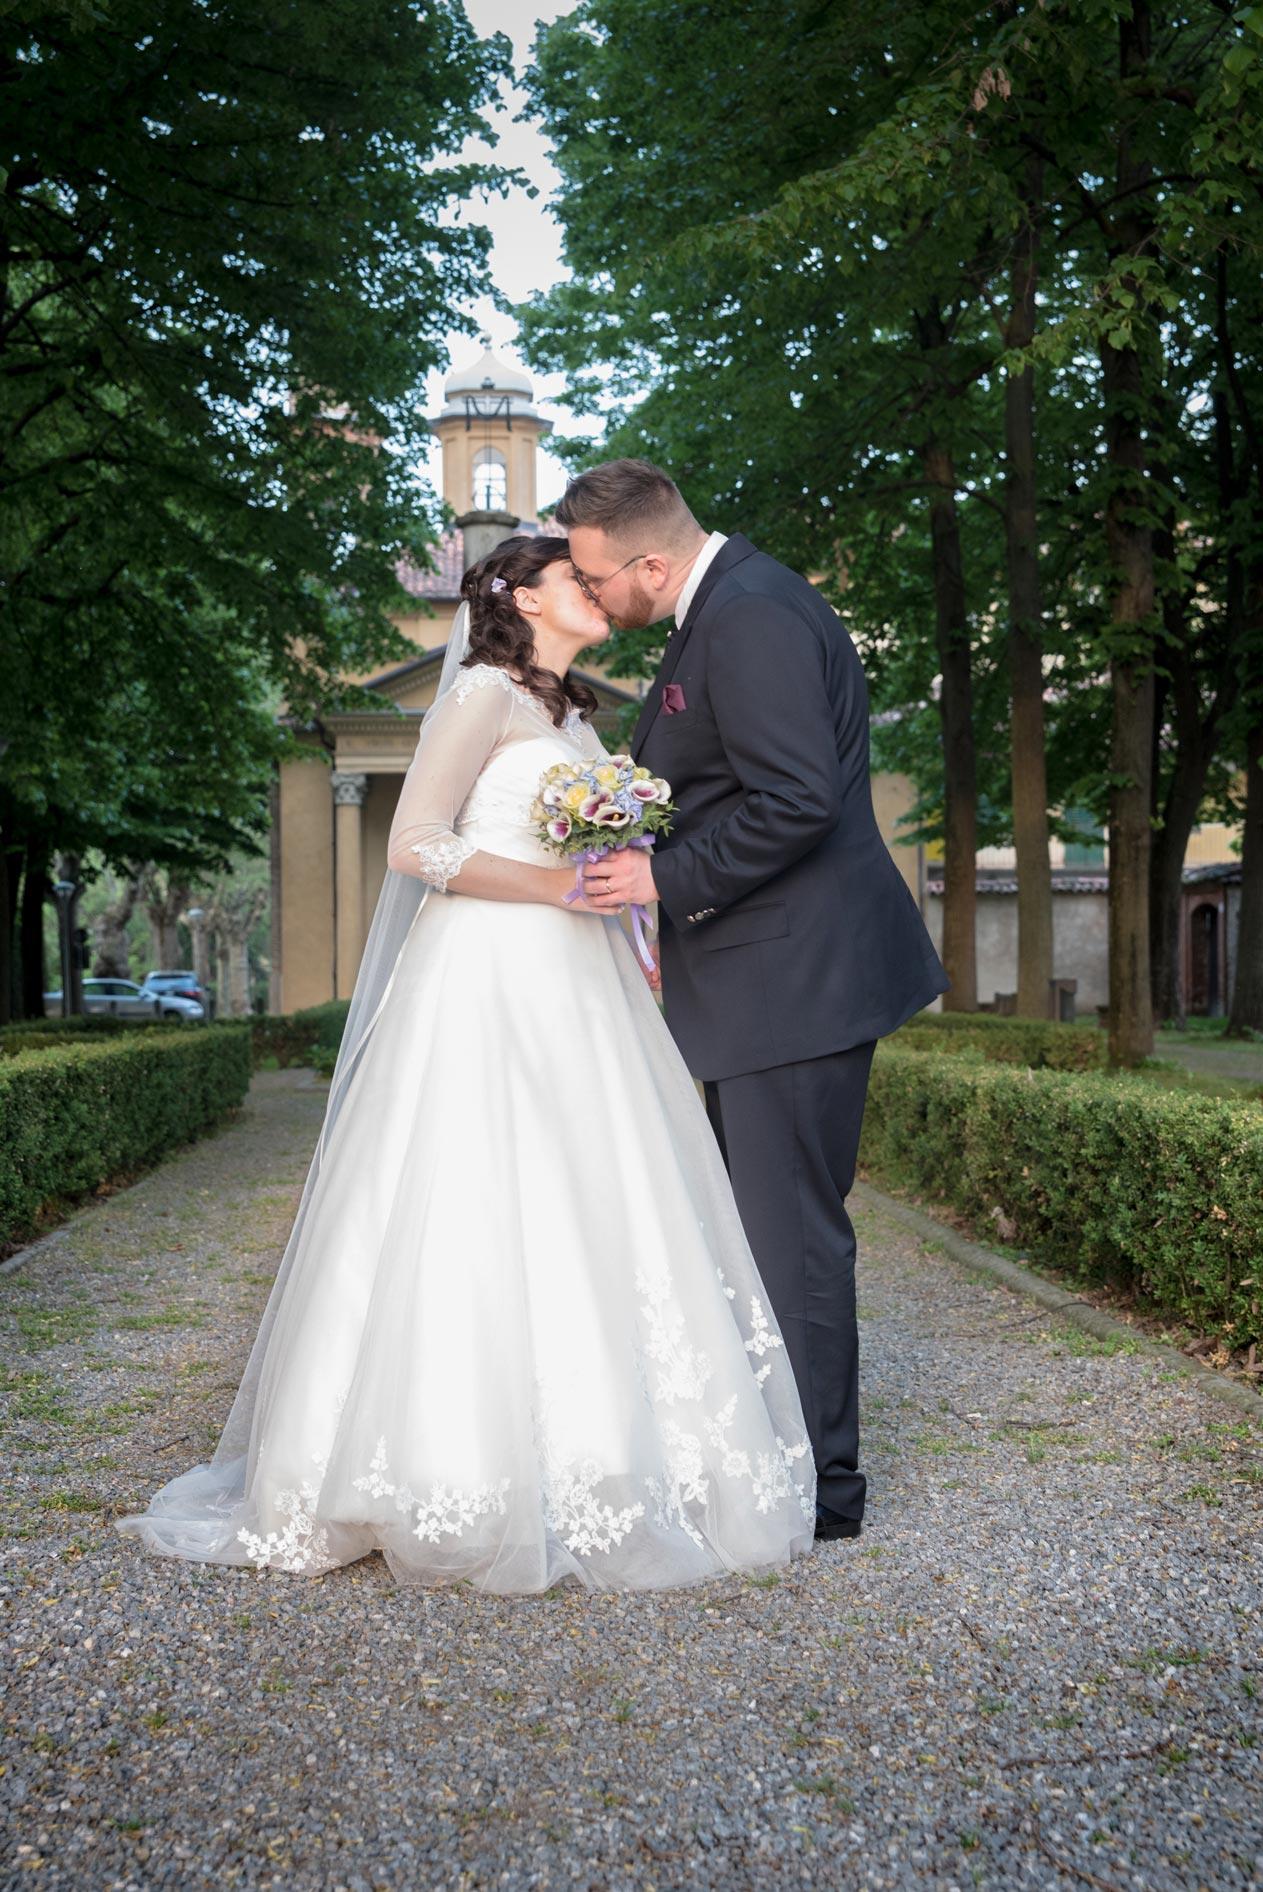 Matrimonio a Narzole Lorenza Diego - DSC 3318 - Fotografo matrimonio Roero - Fotografo matrimonio Roero